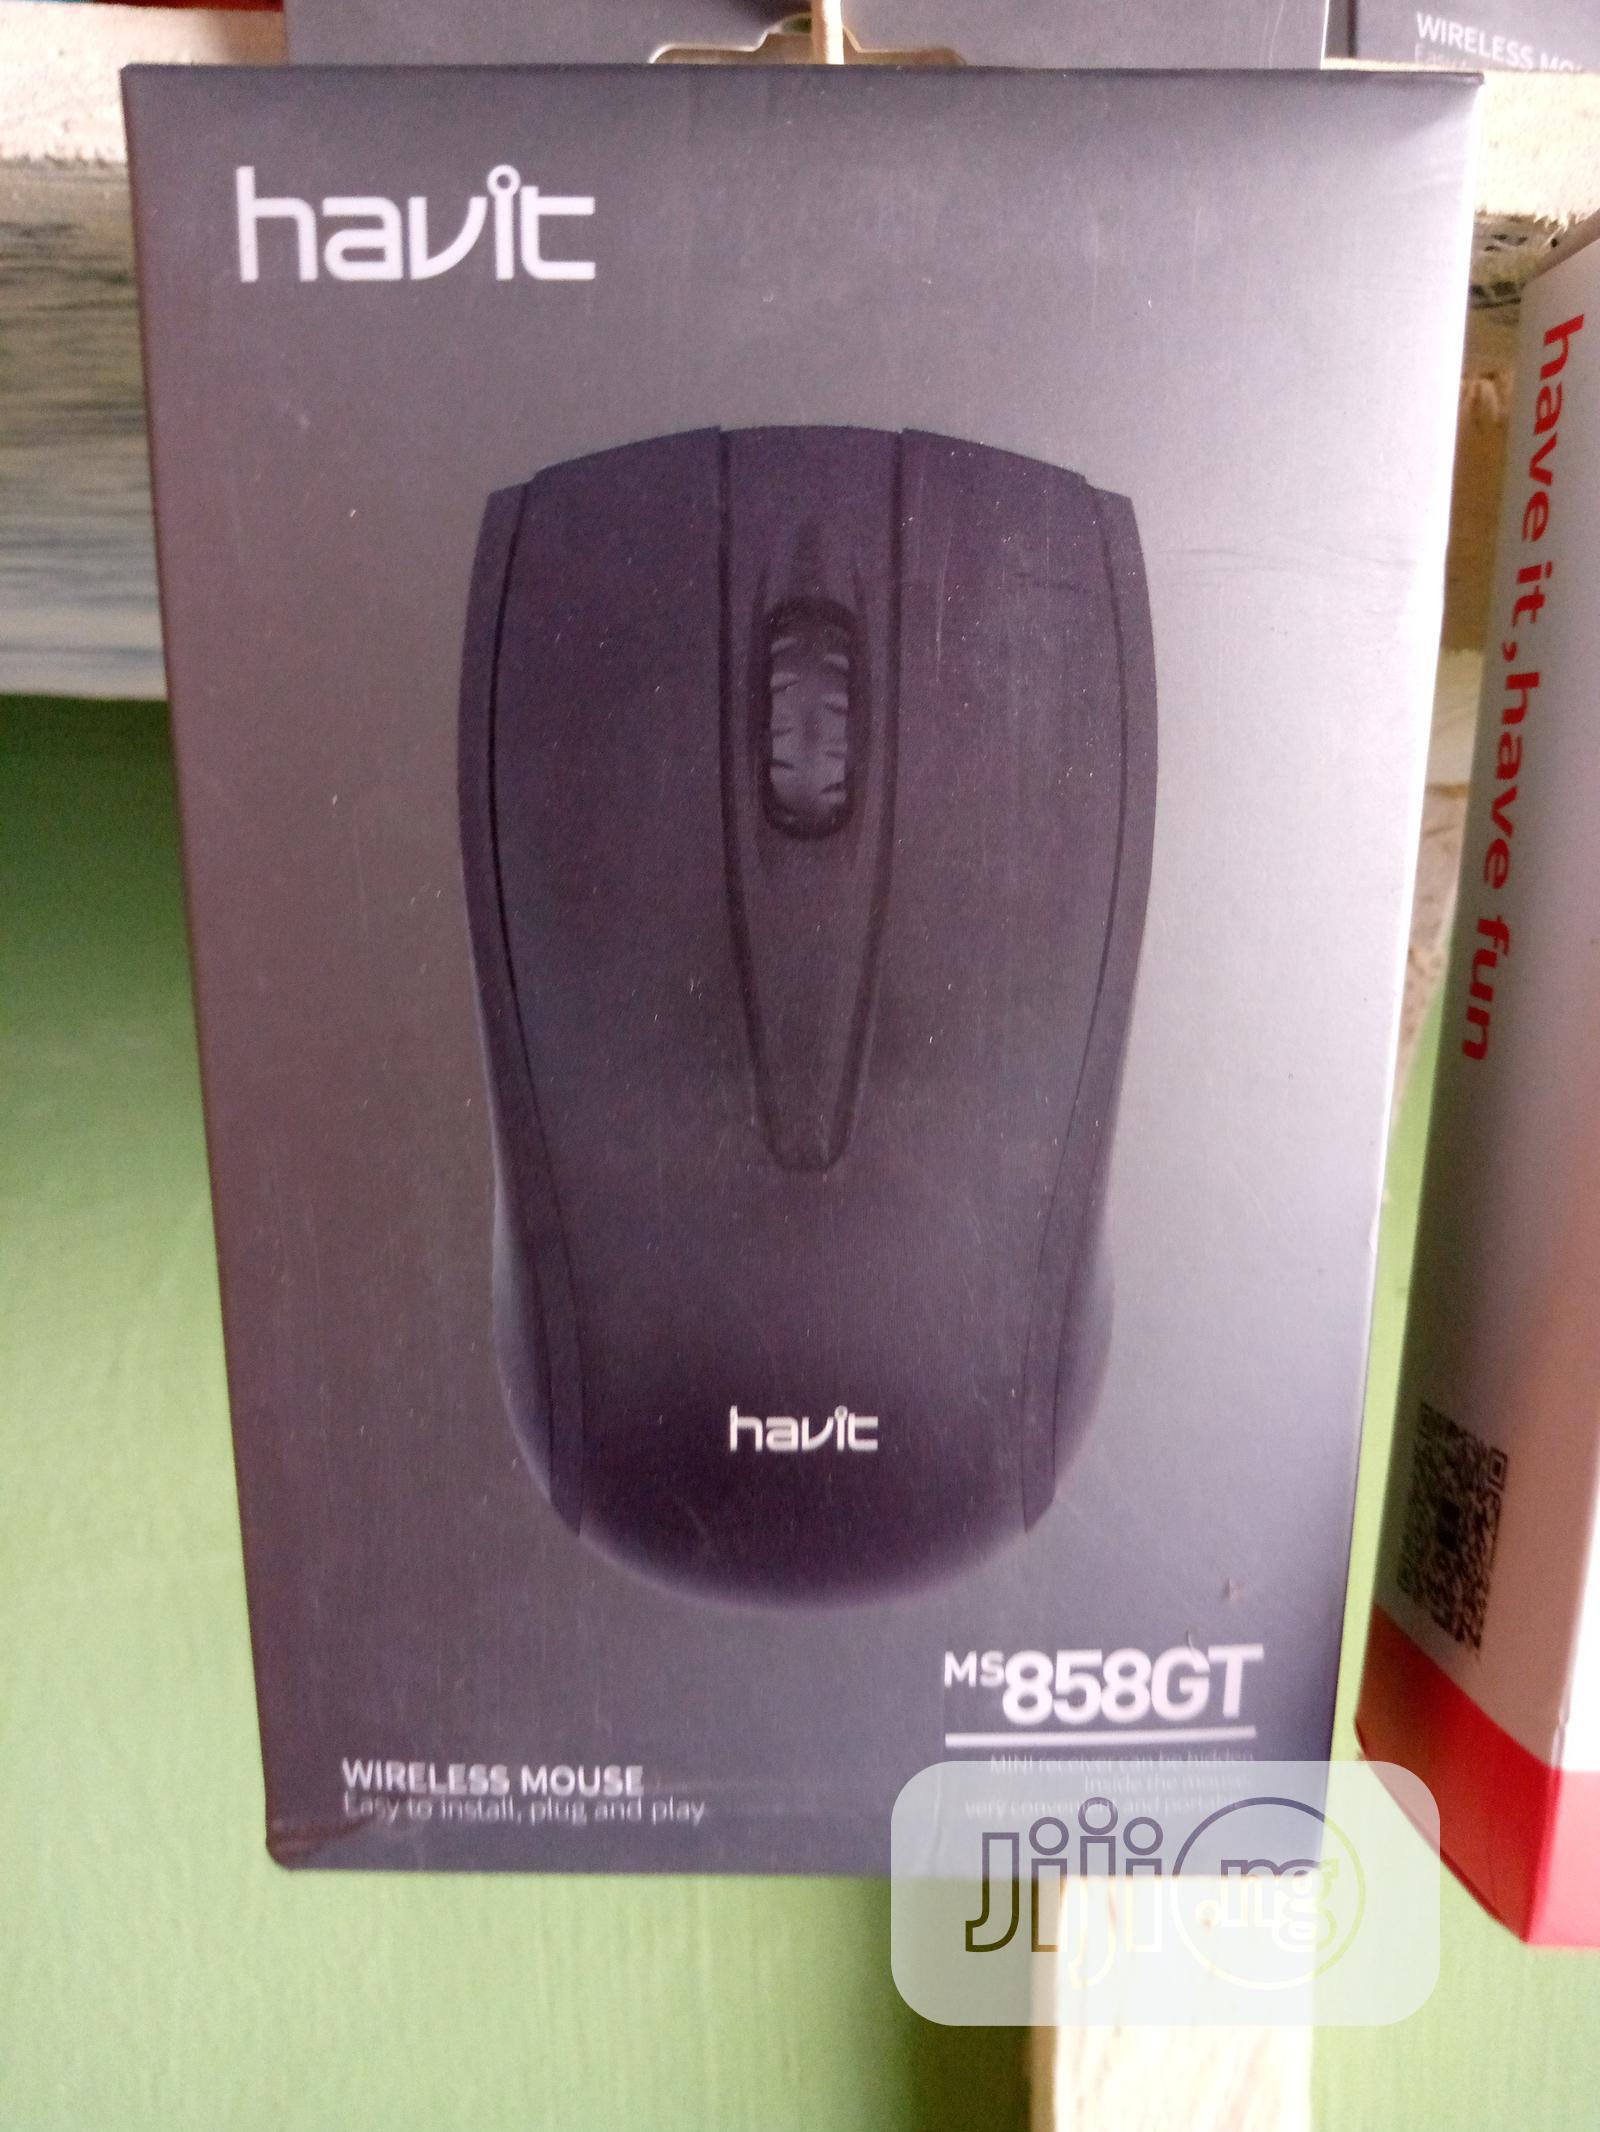 Wireless Mouse Havic